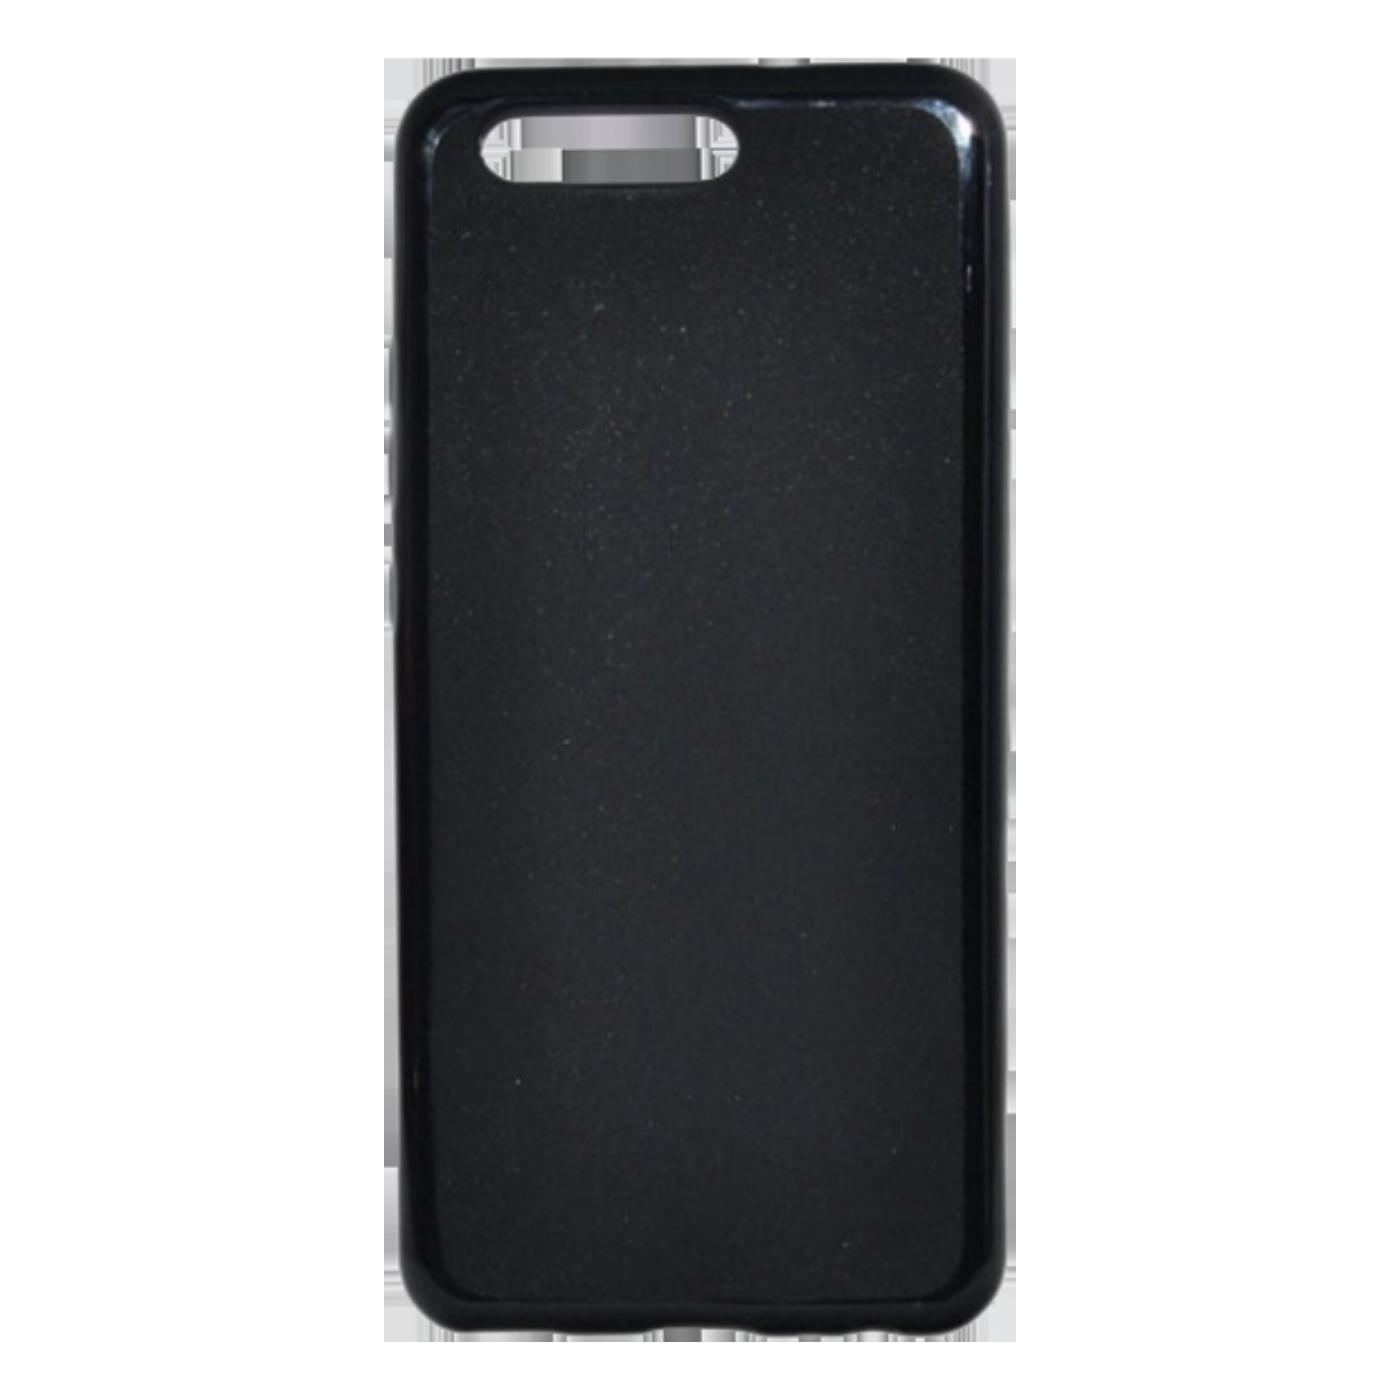 Futrola za mobitel Huawei P8 lite, silikonska, crna